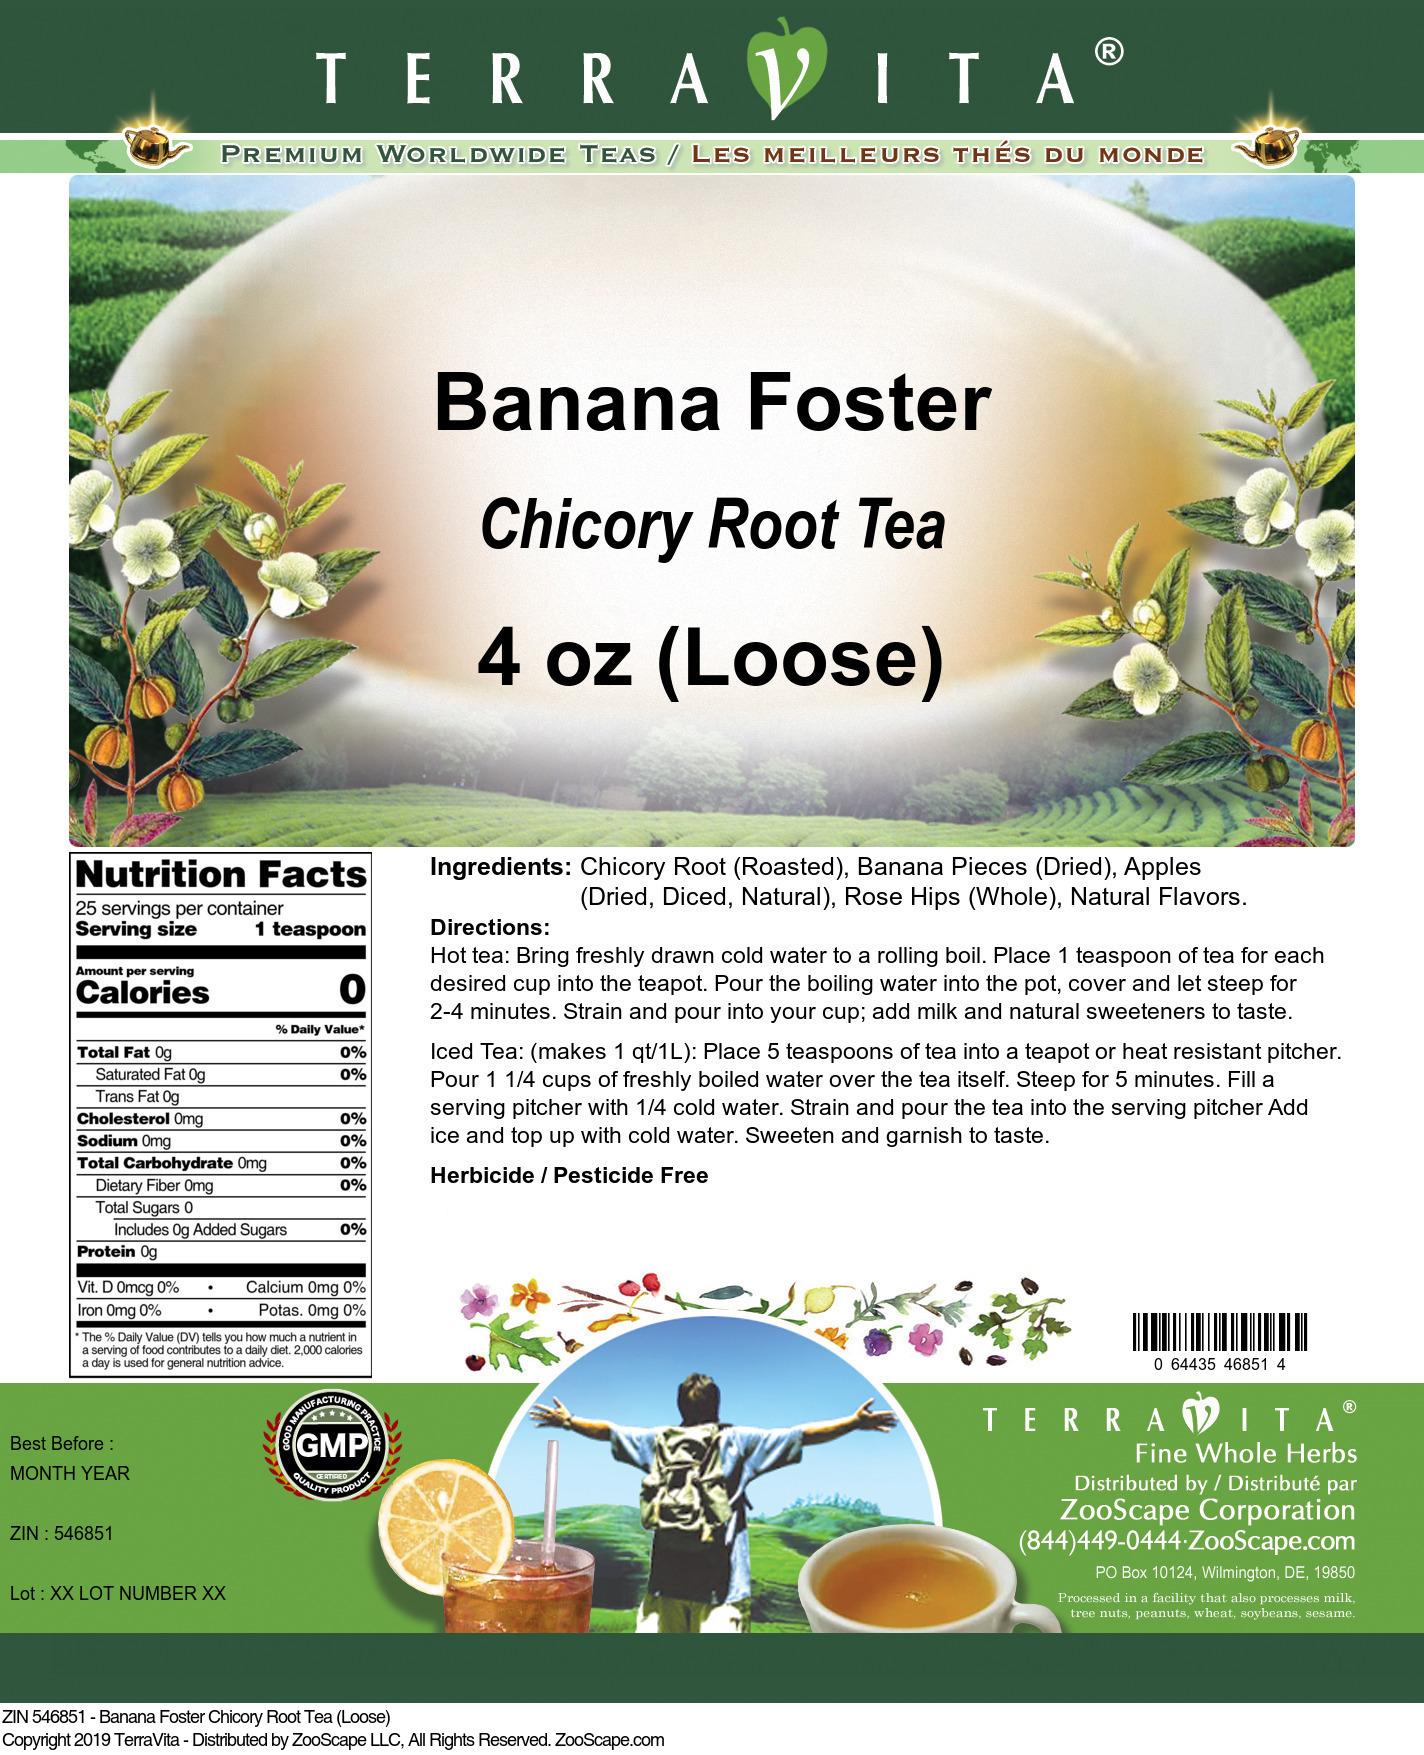 Banana Foster Chicory Root Tea (Loose)